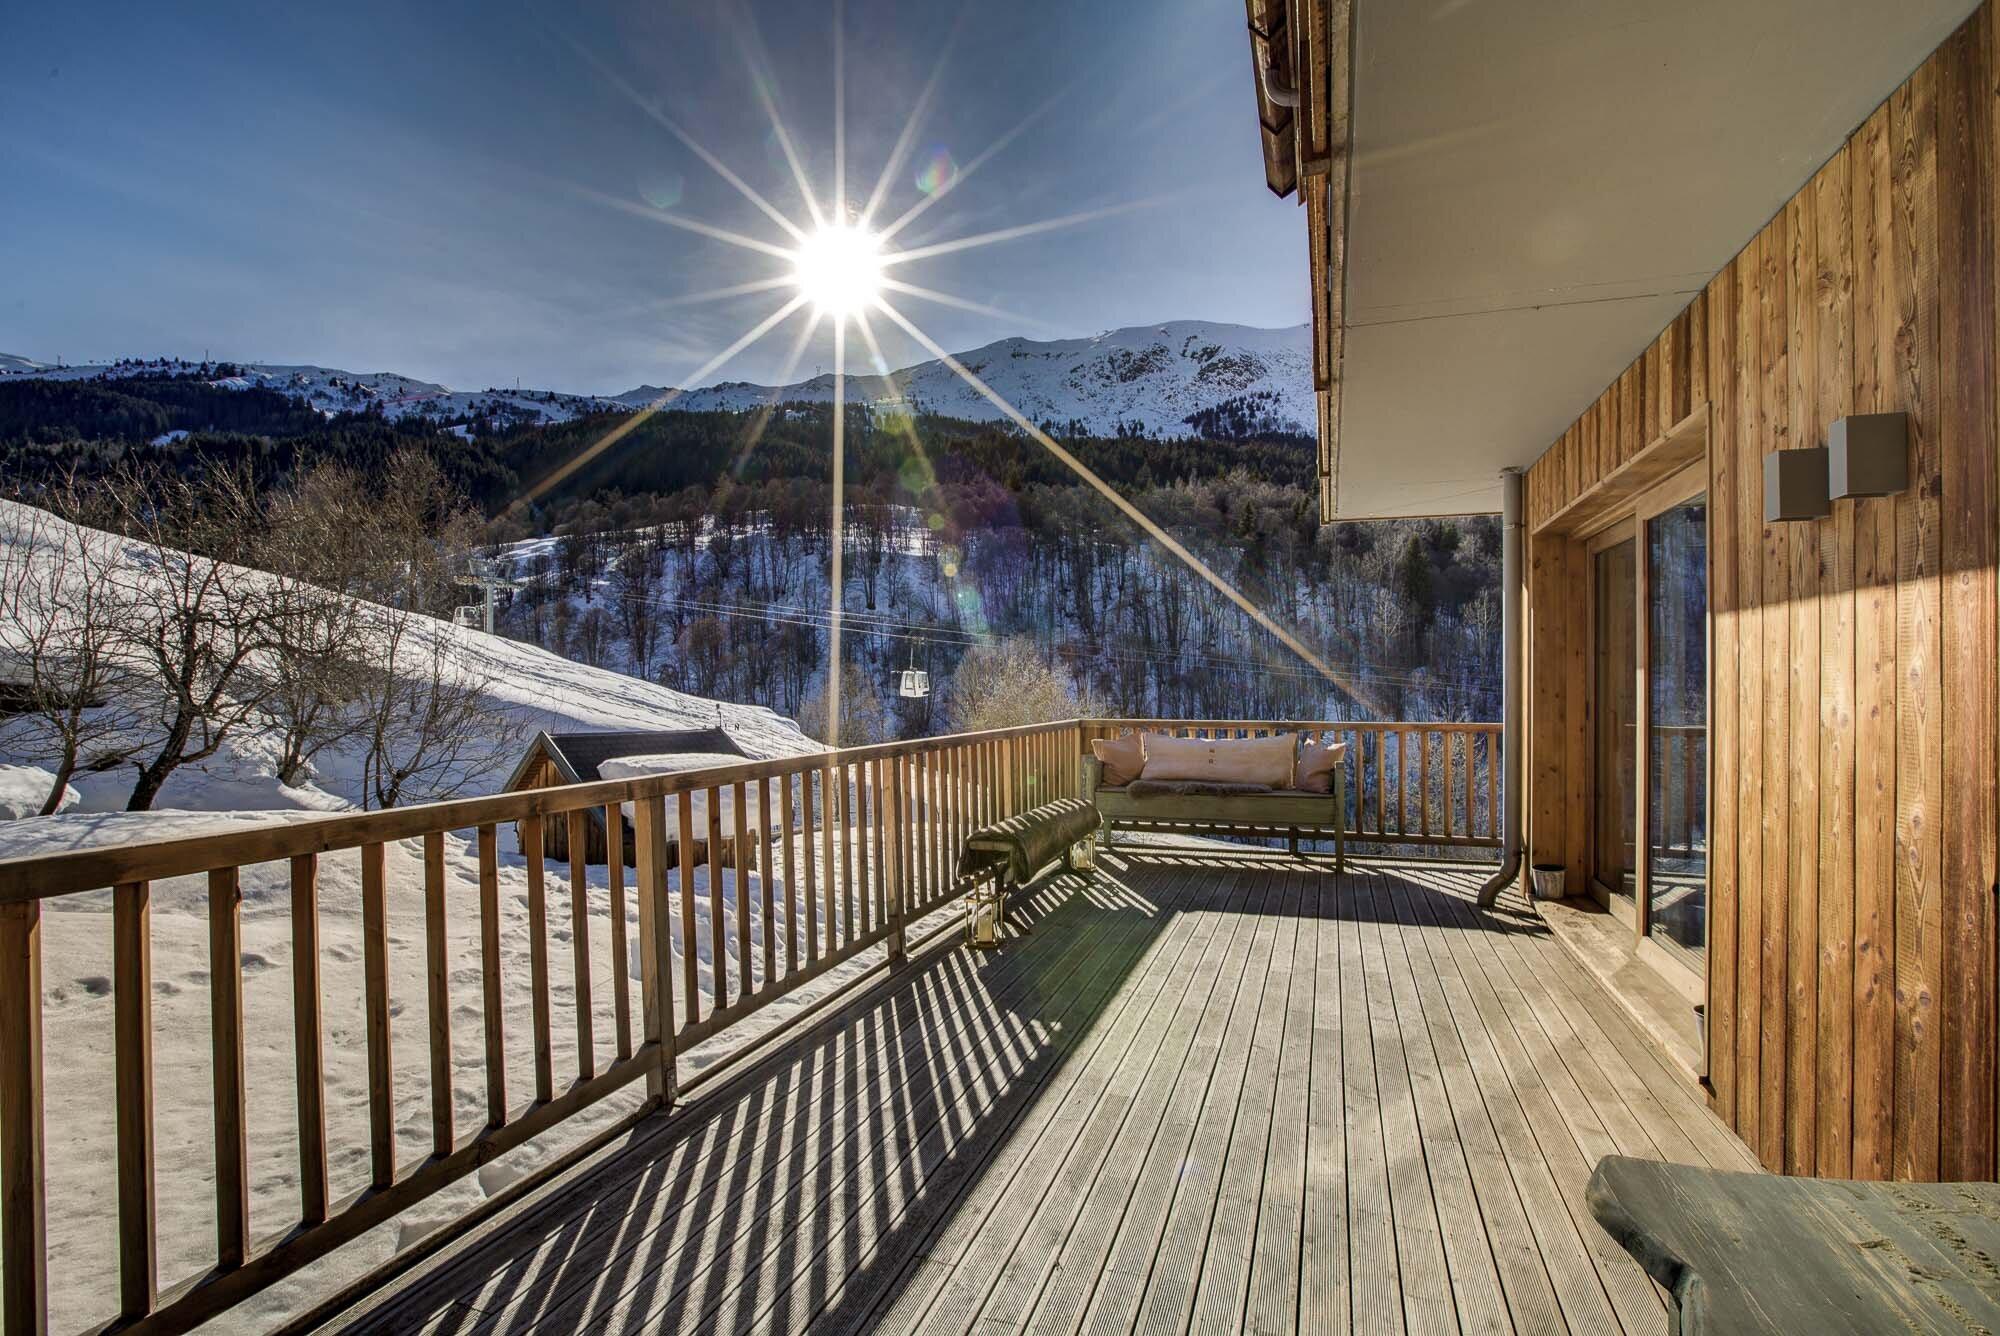 tg-ski-luxury-chalet-lightbowne-meribel-005